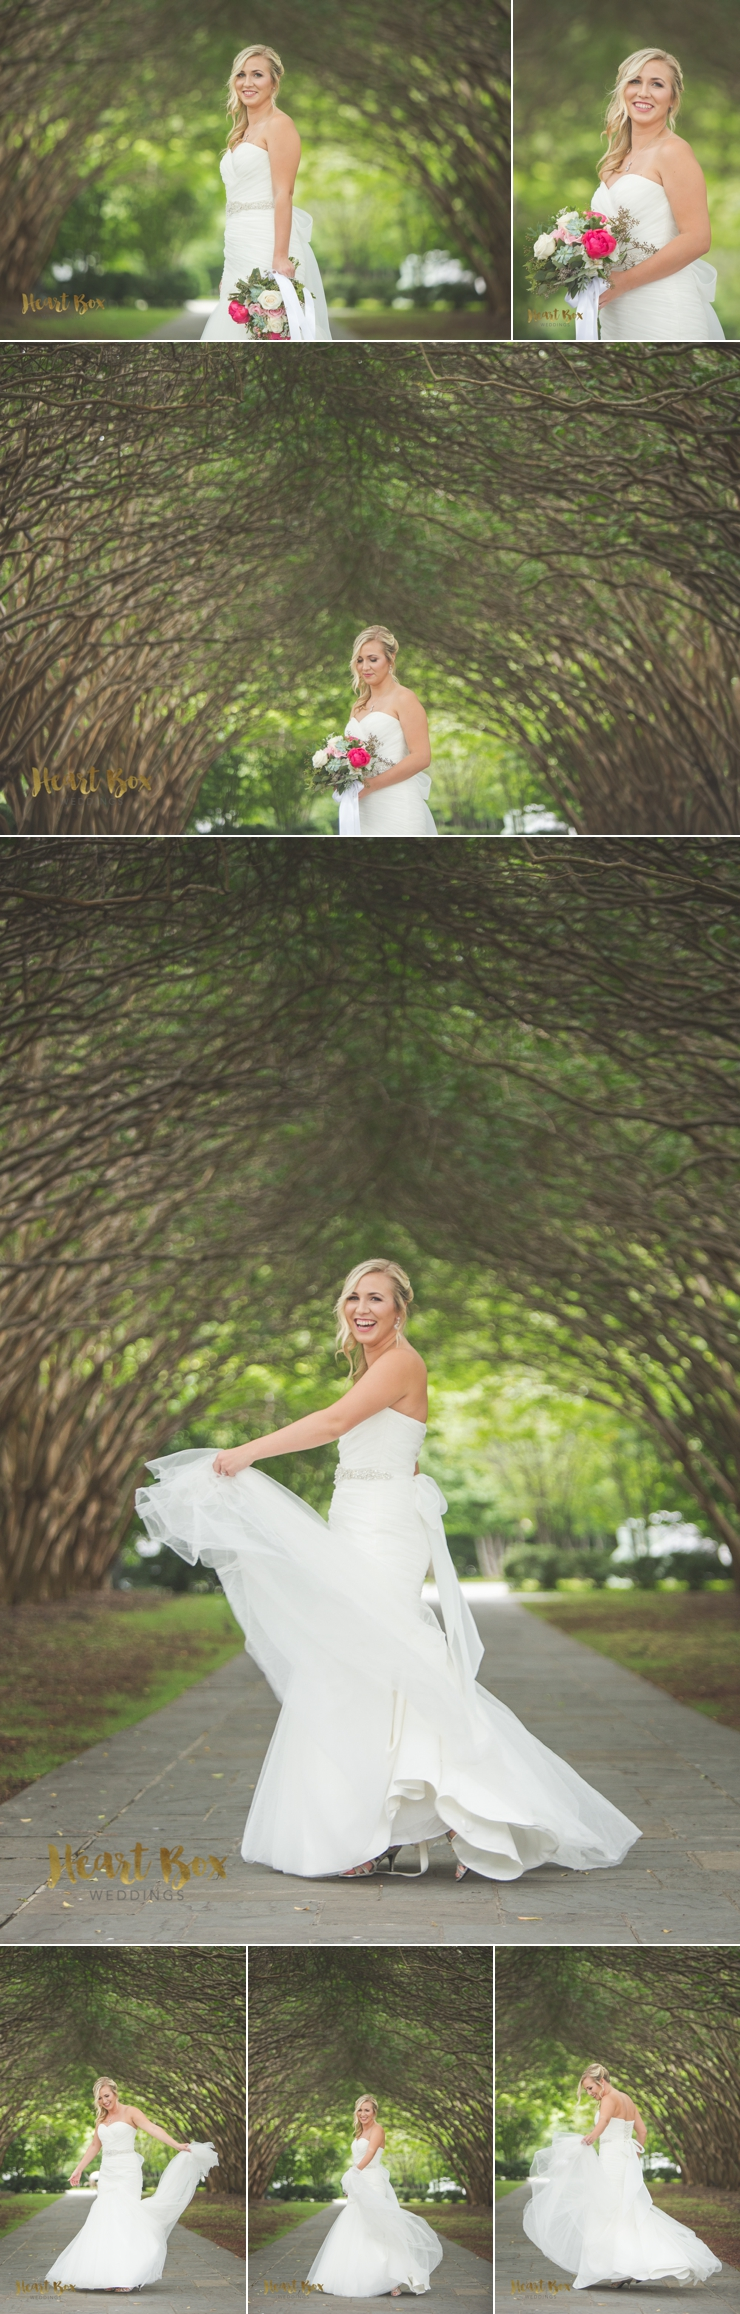 Karlee Bridal Blog Collages 2.jpg